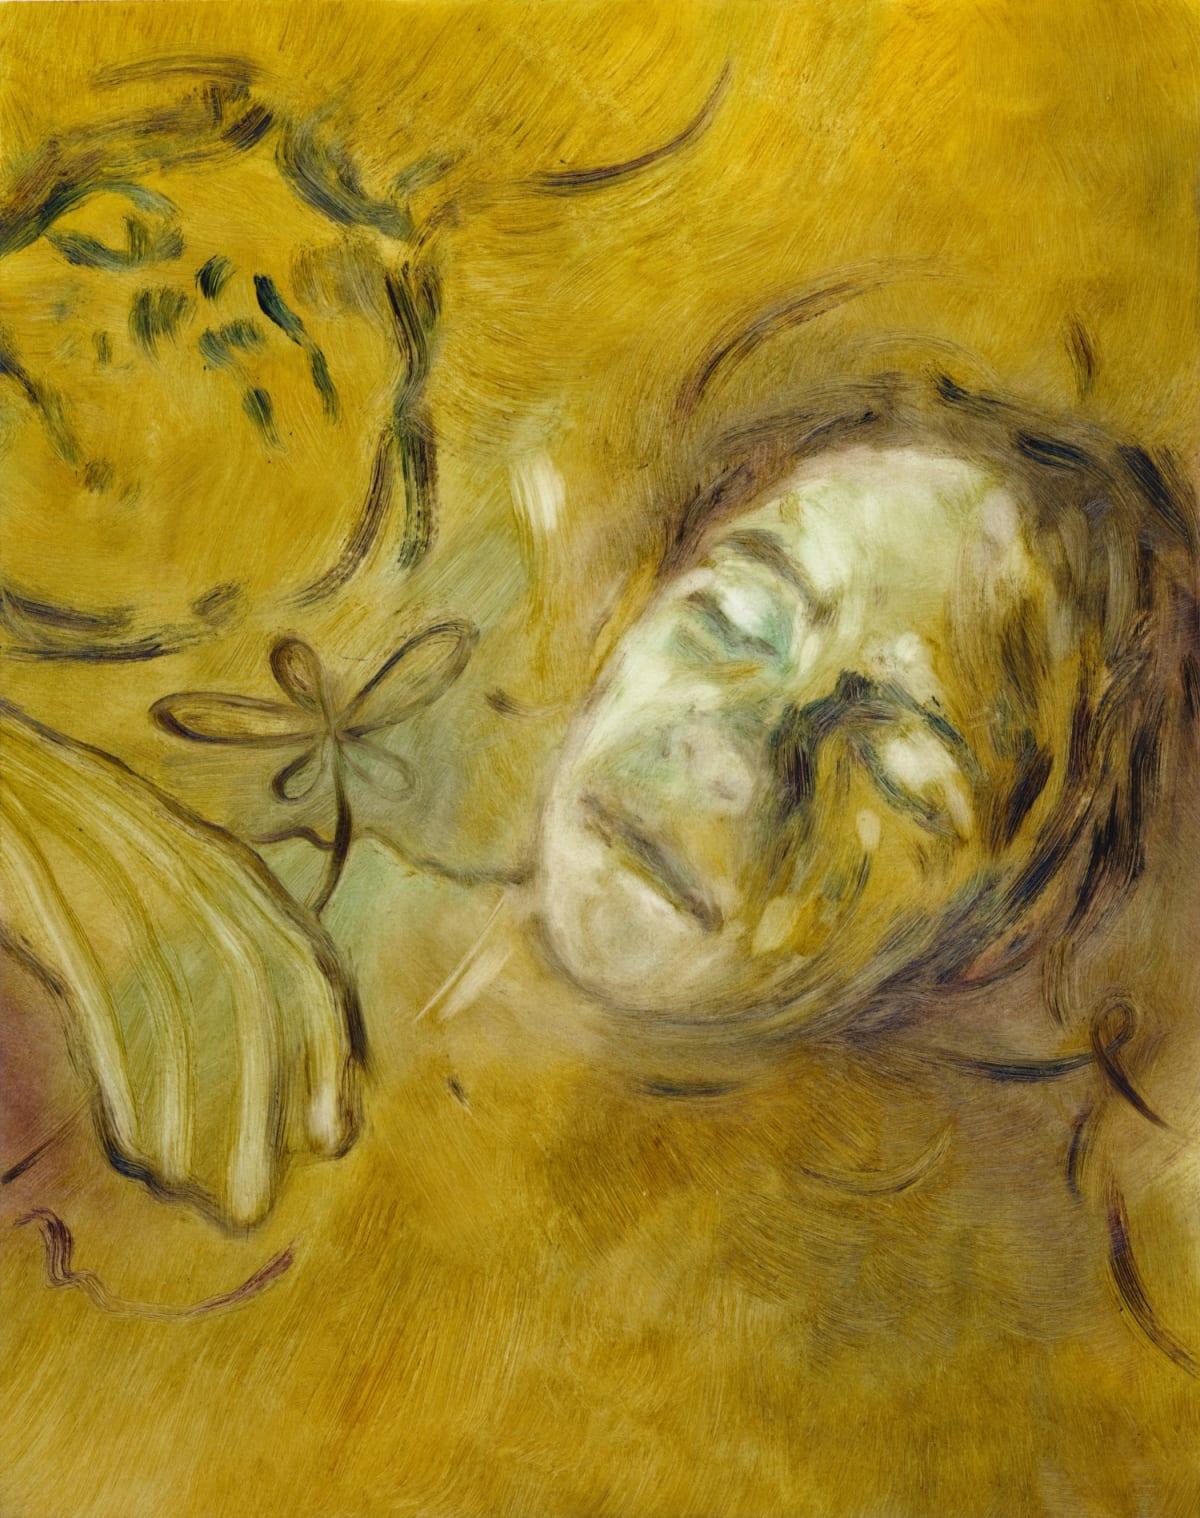 Sarah Biggs, Sleepers, 2019